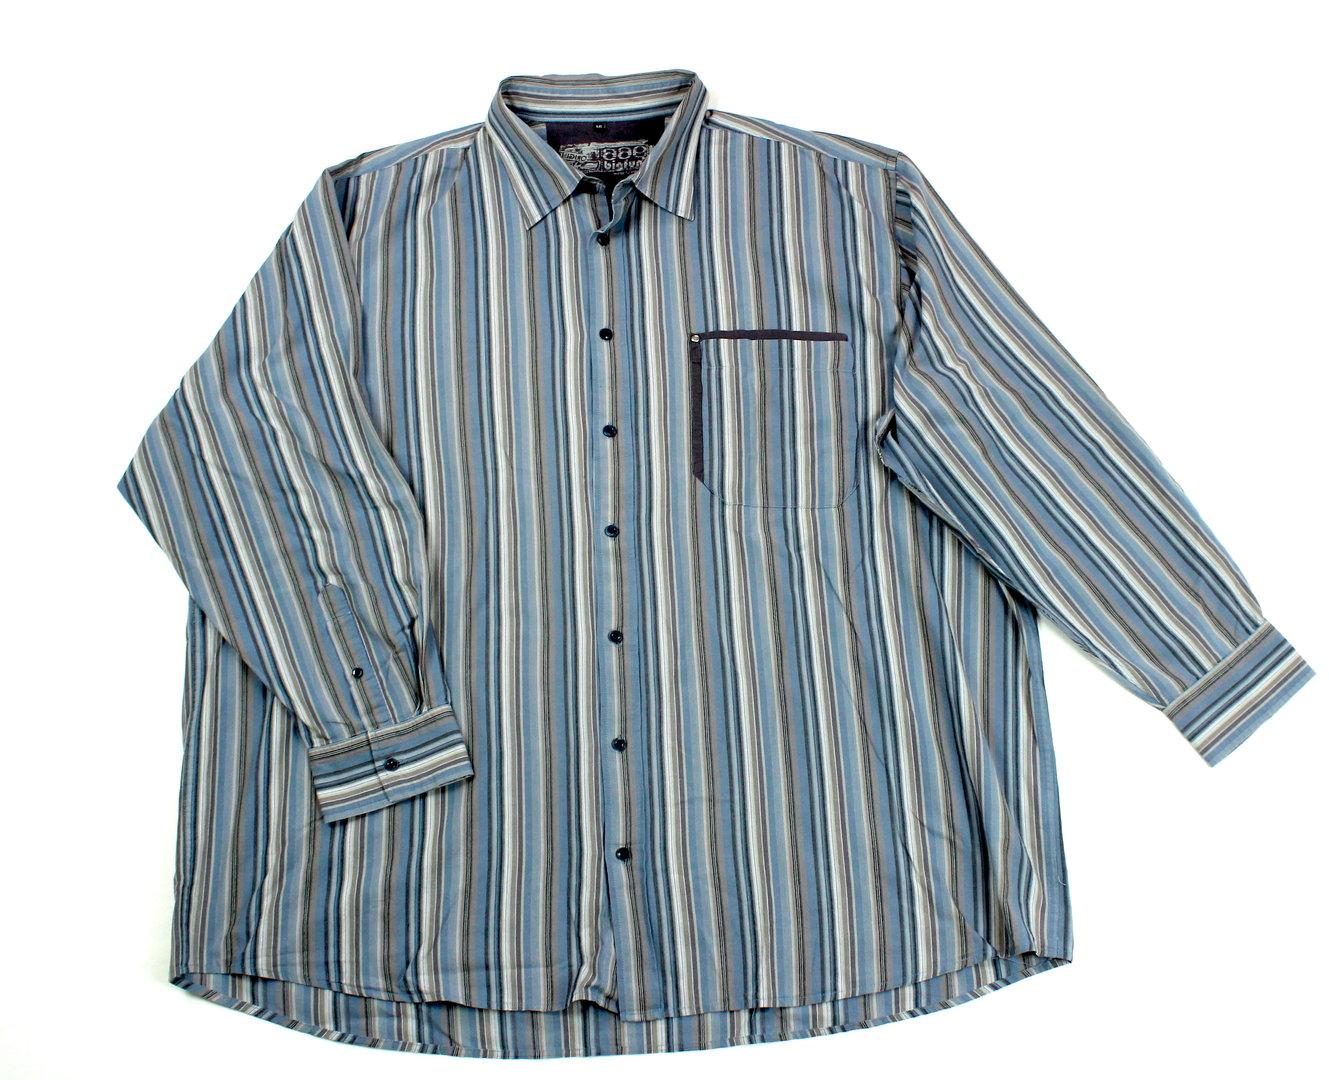 finest selection f1ff5 c488b BIG FUN Freizeit Hemd gestreift Übergröße bleu Langarm 4XL